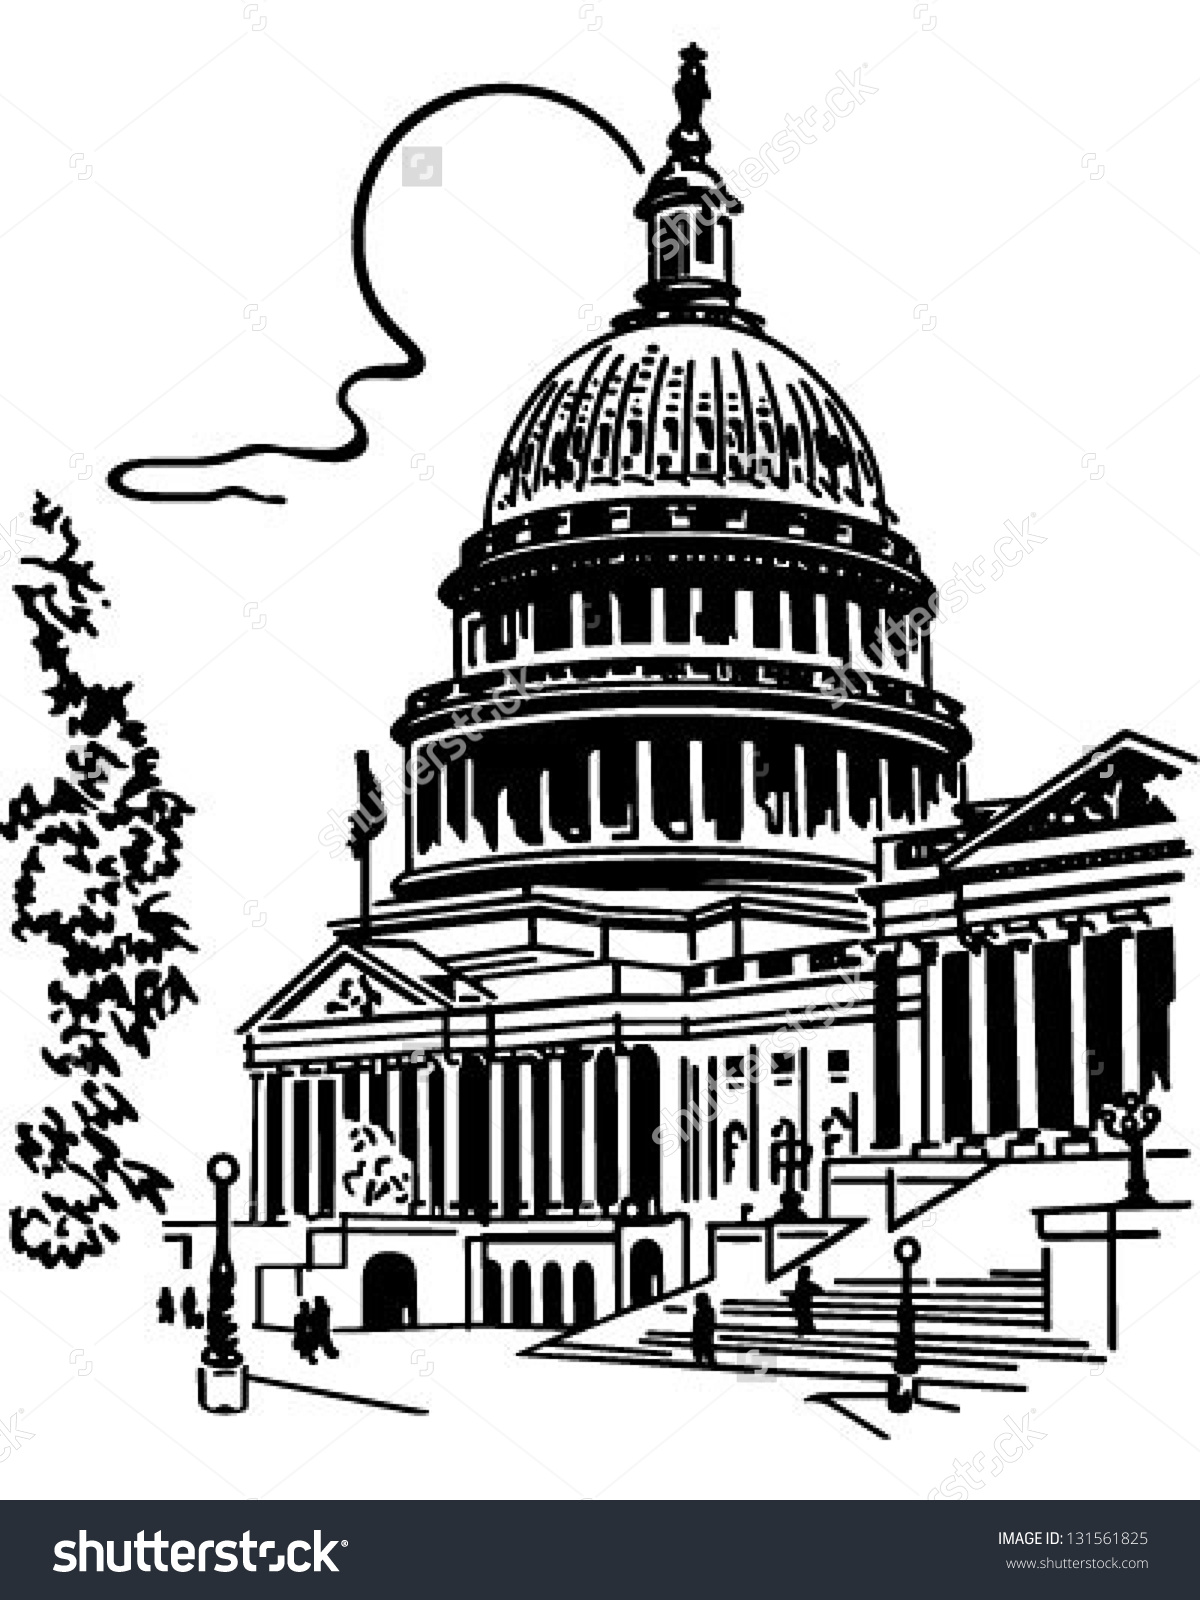 Buildings clipart vector. Capitol building collection soscivilizations